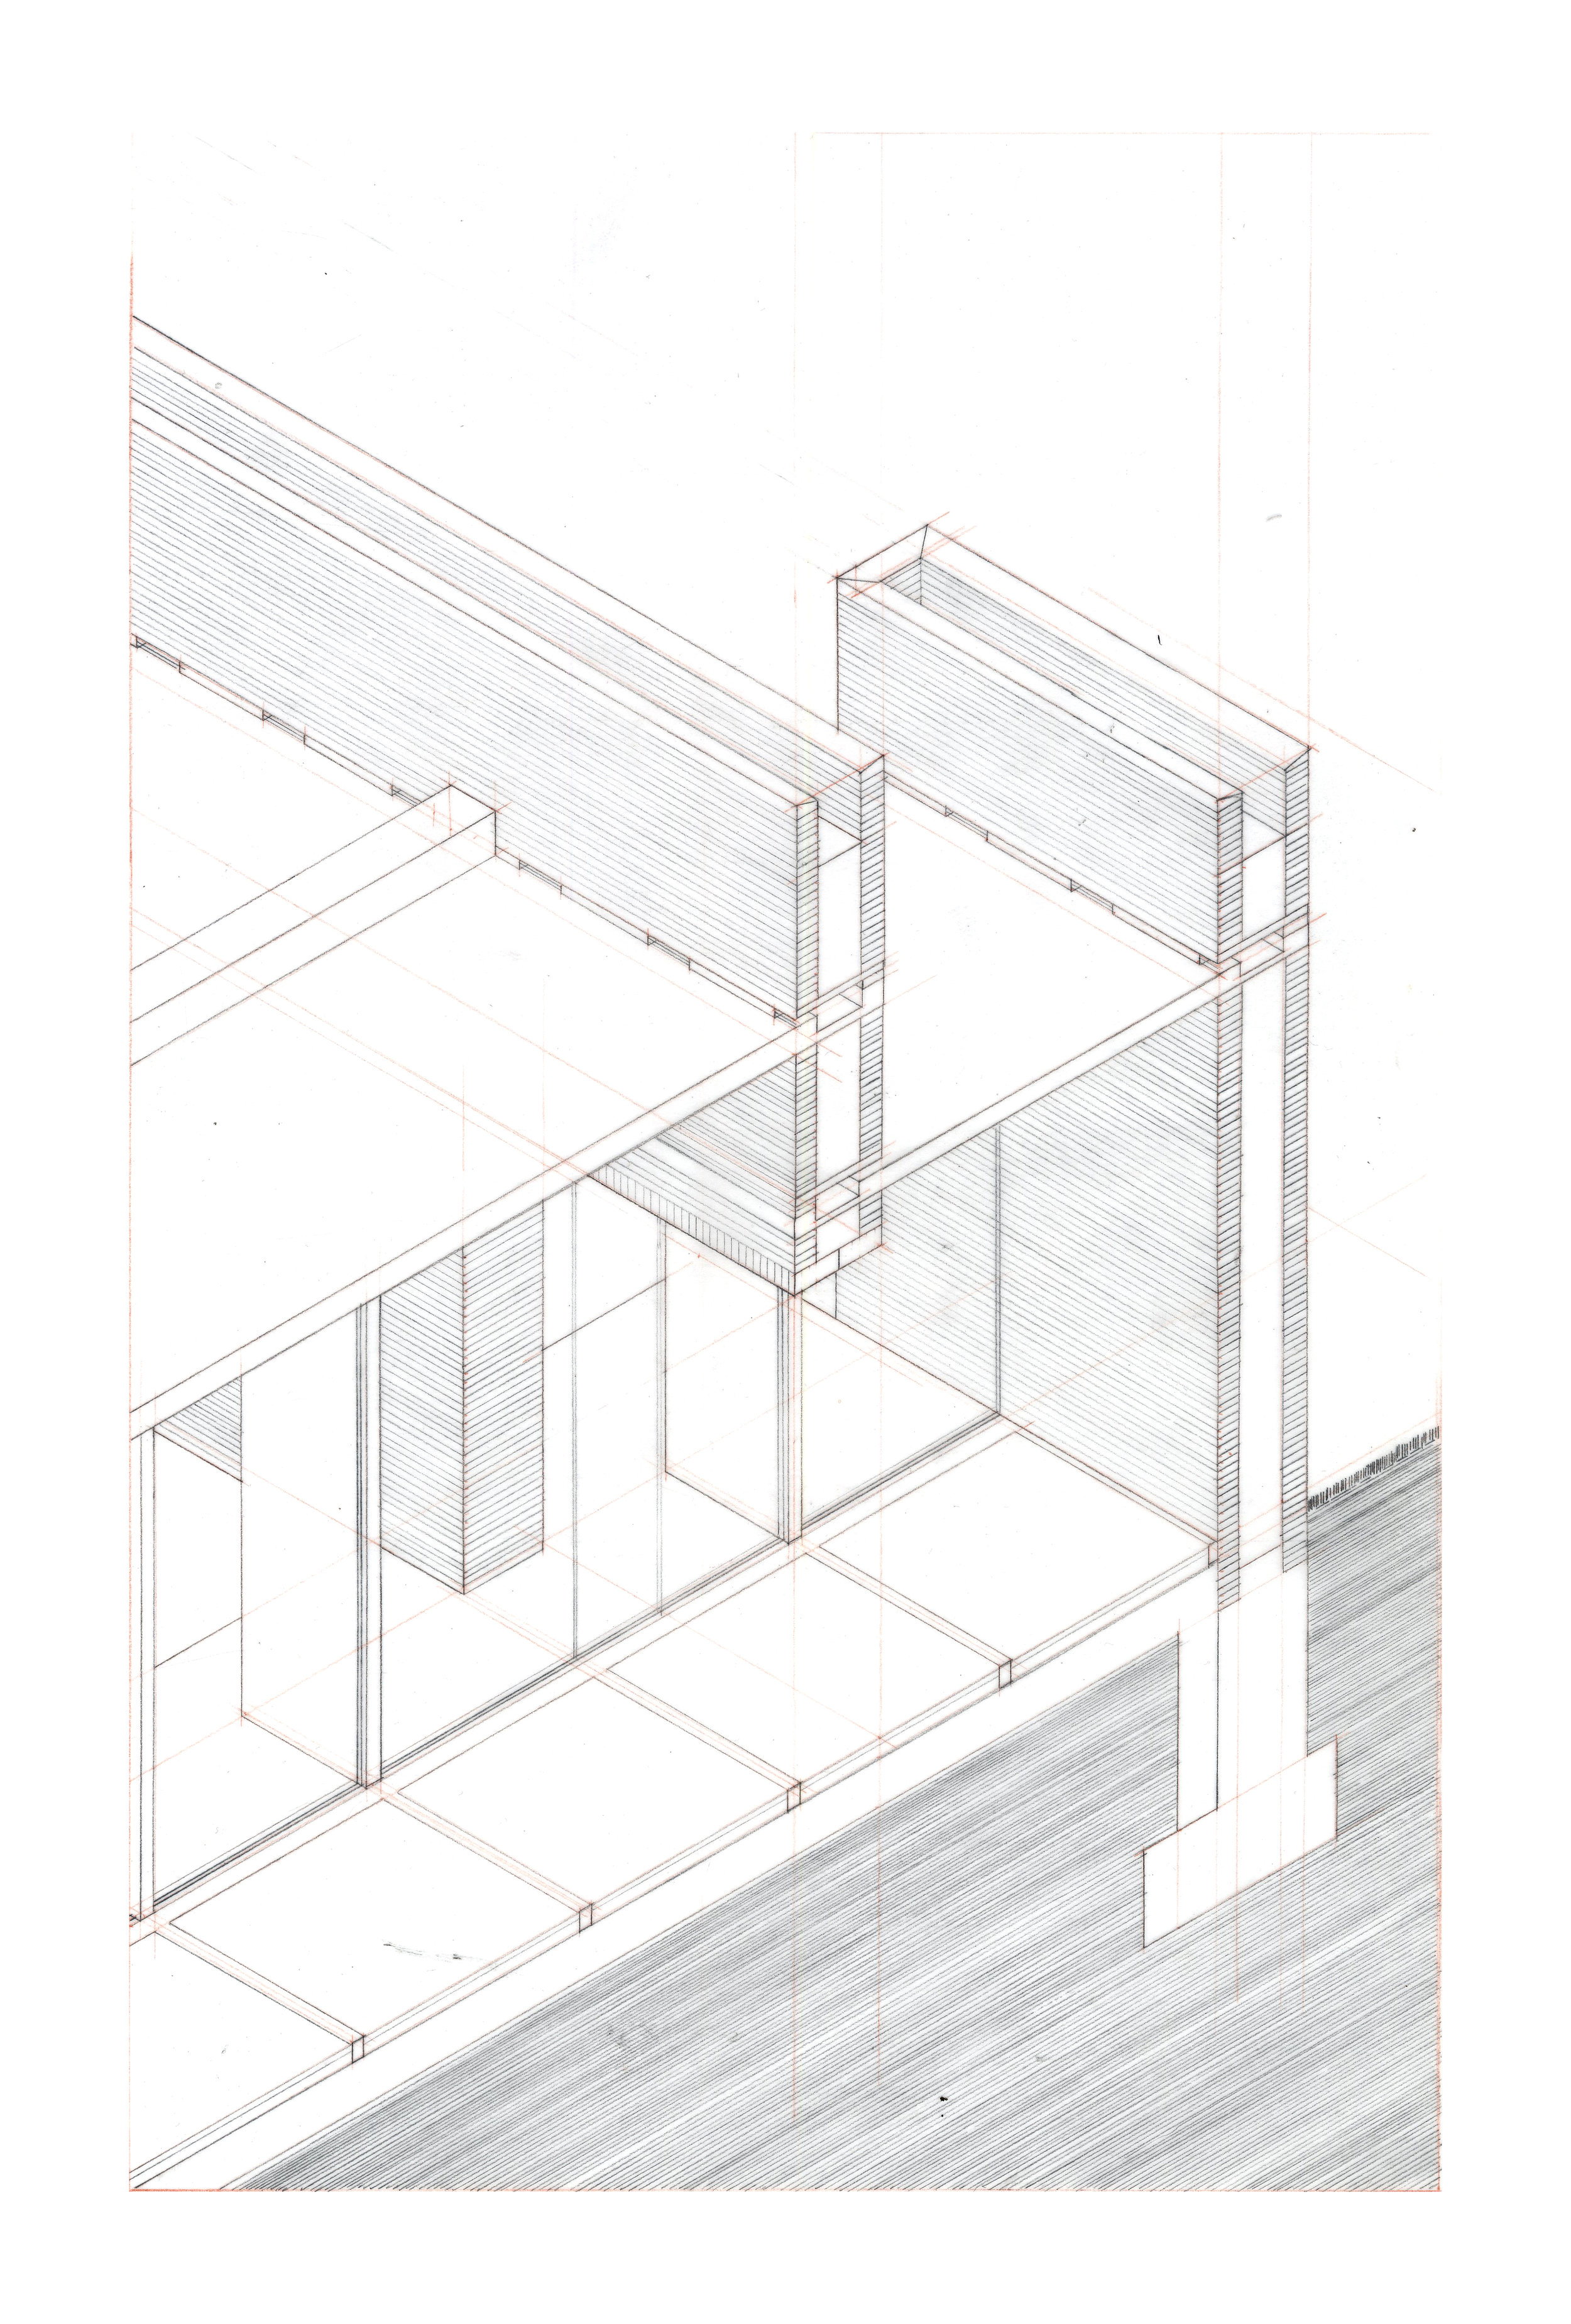 SectionIso_002.jpg